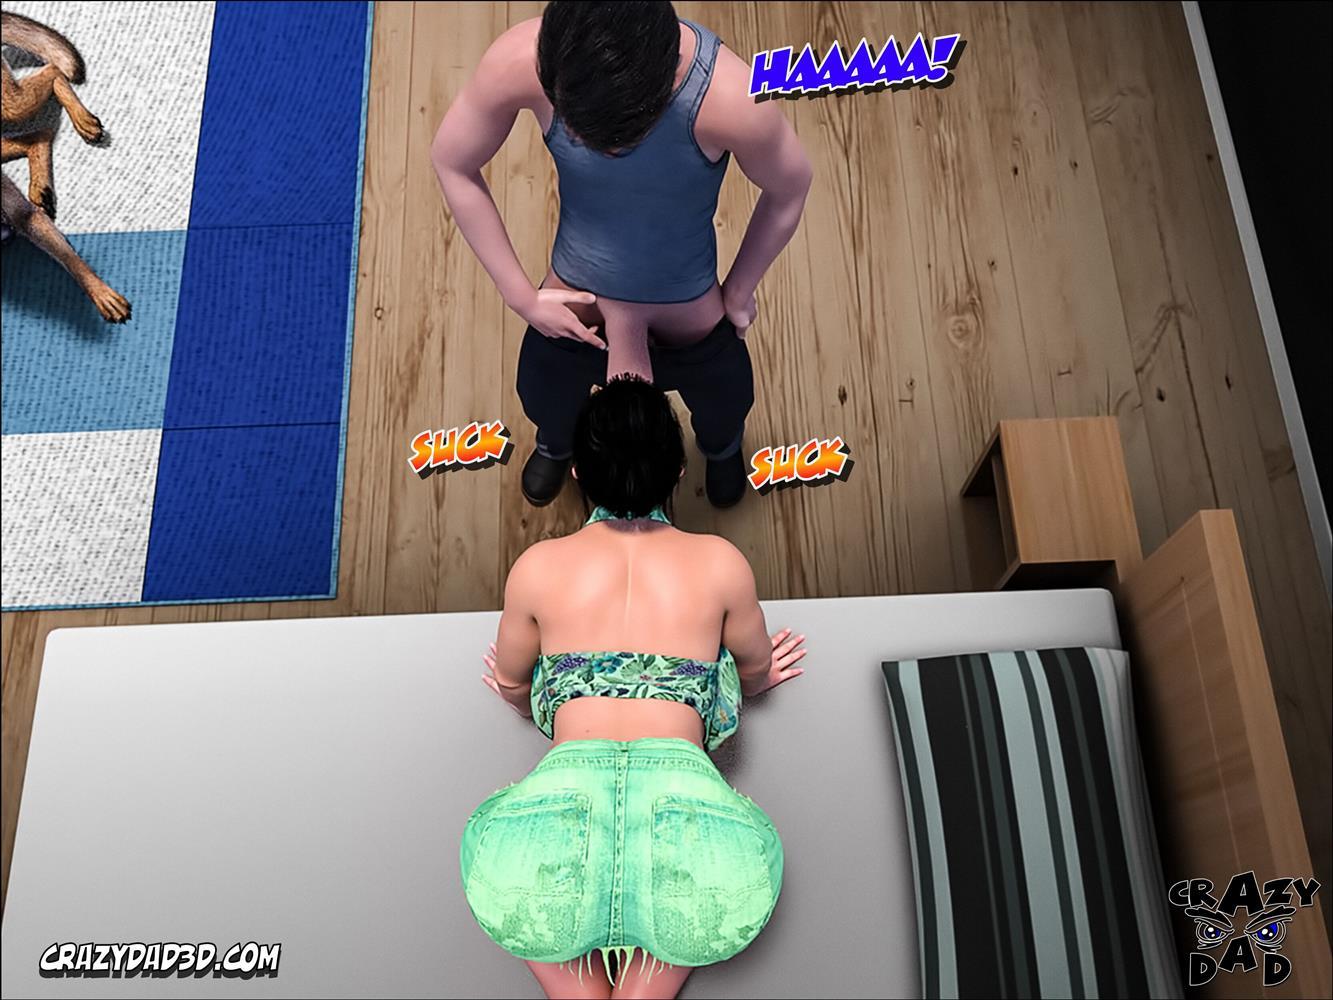 Mom's Help 20 [Crazy Dad 3D] - Foto 78